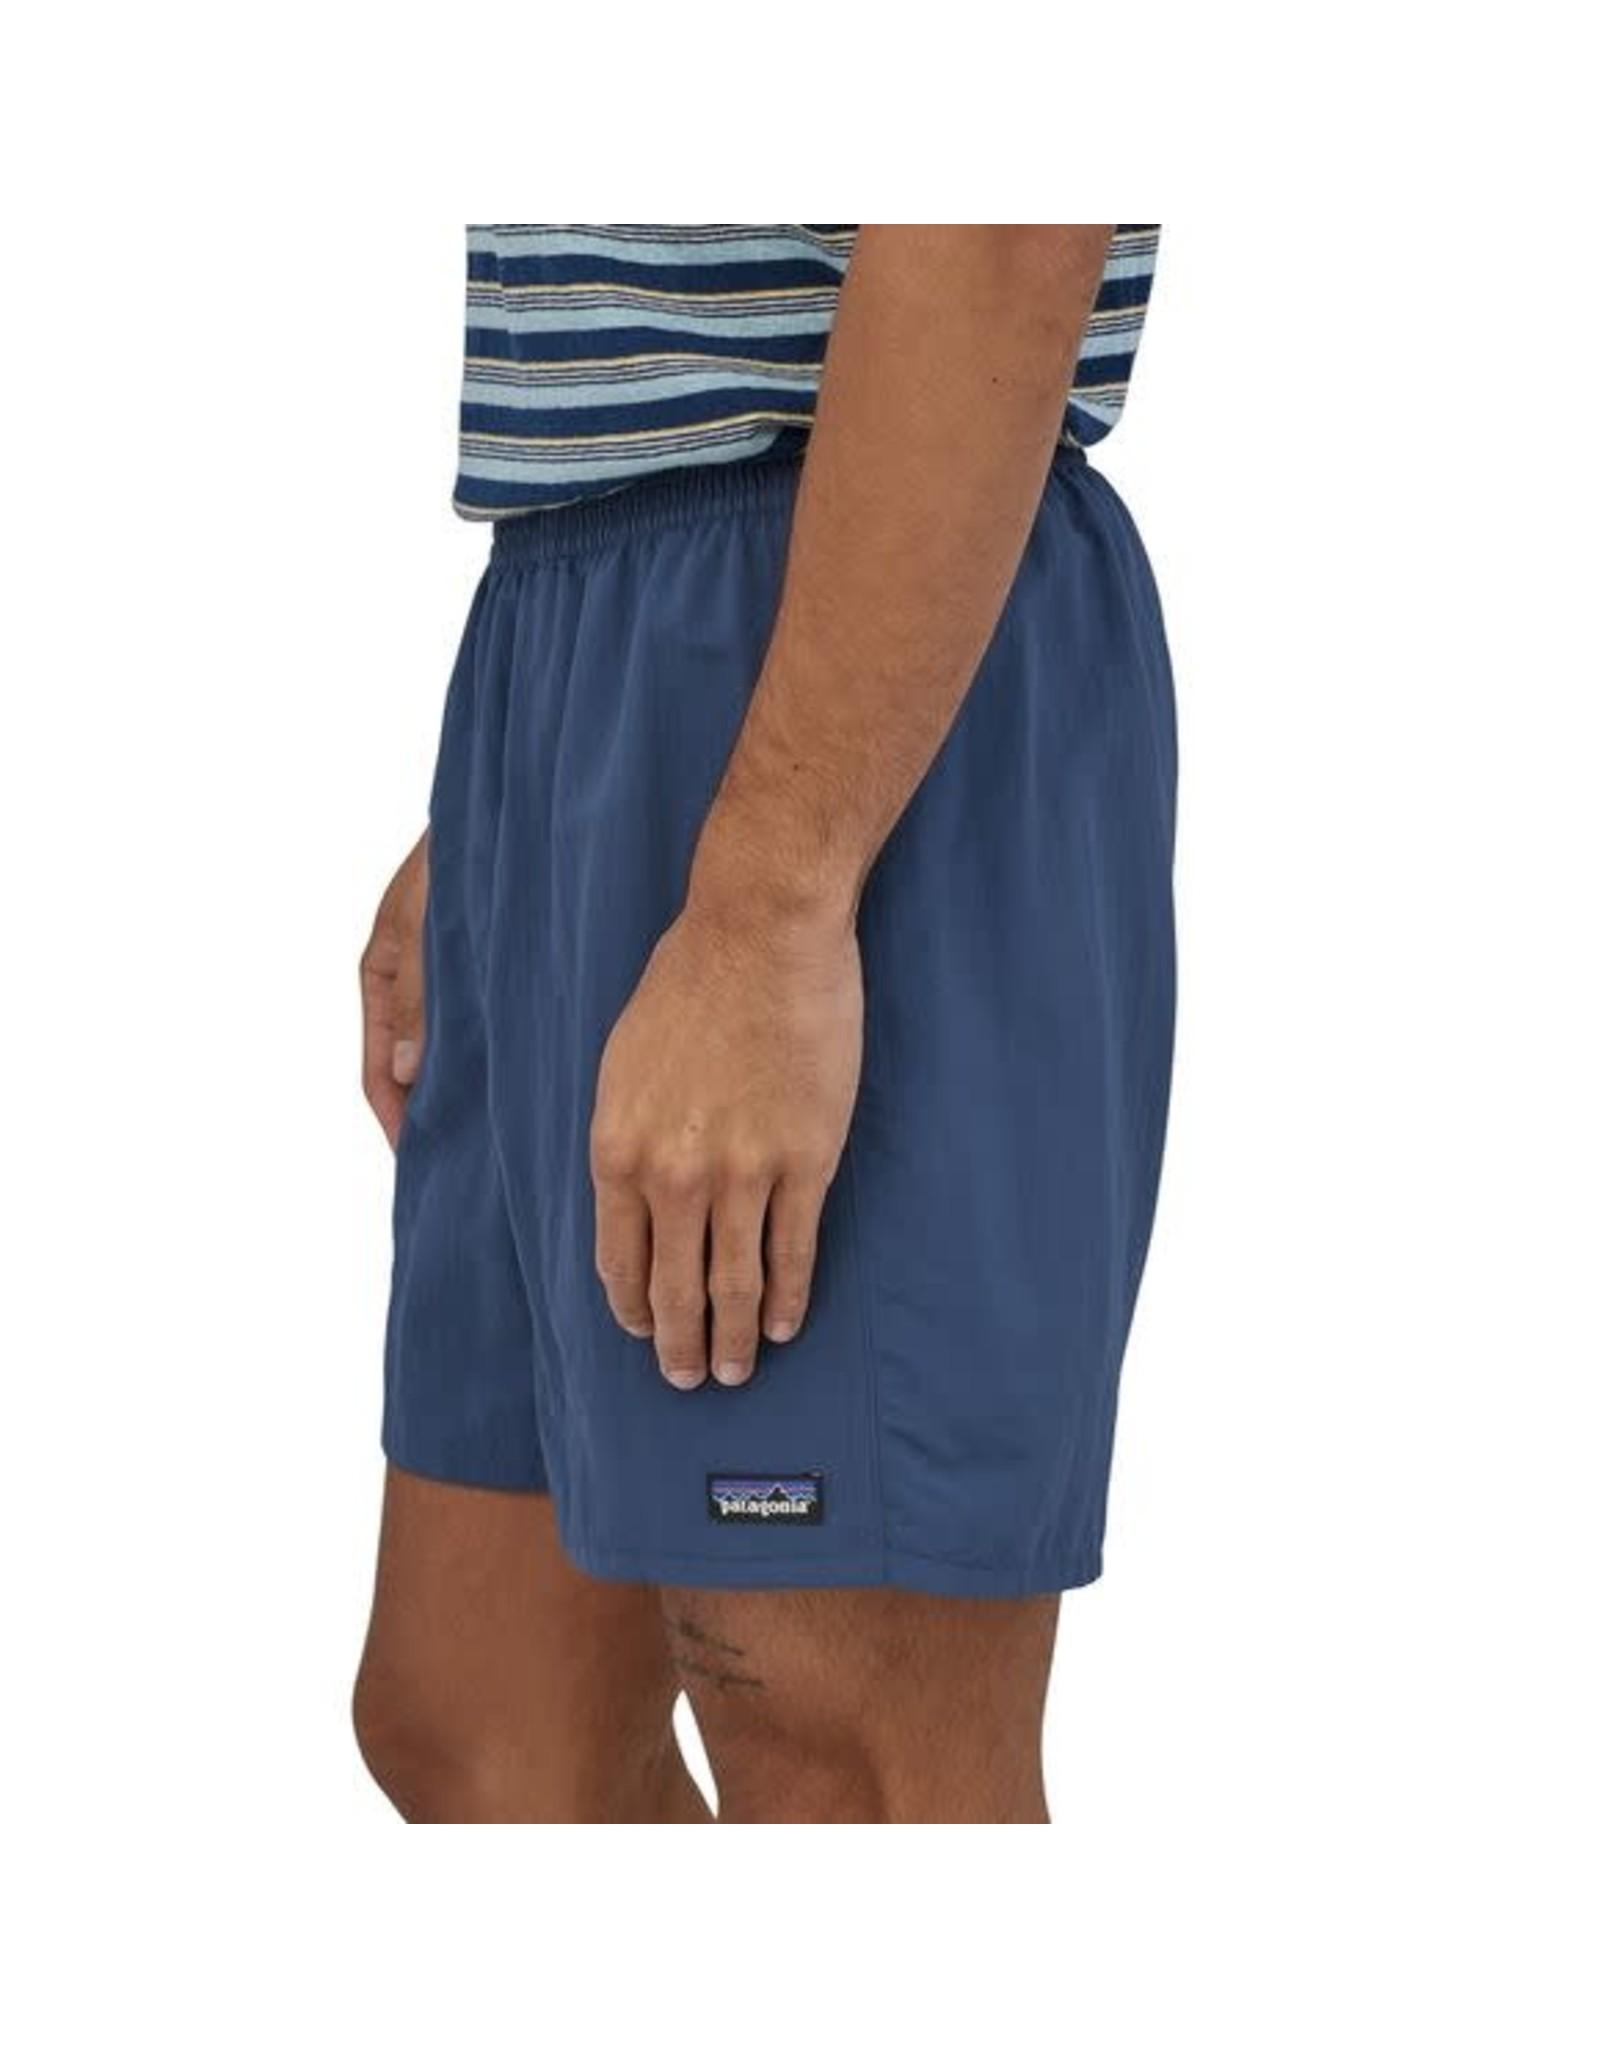 Patagonia M's Baggies Shorts - 5in